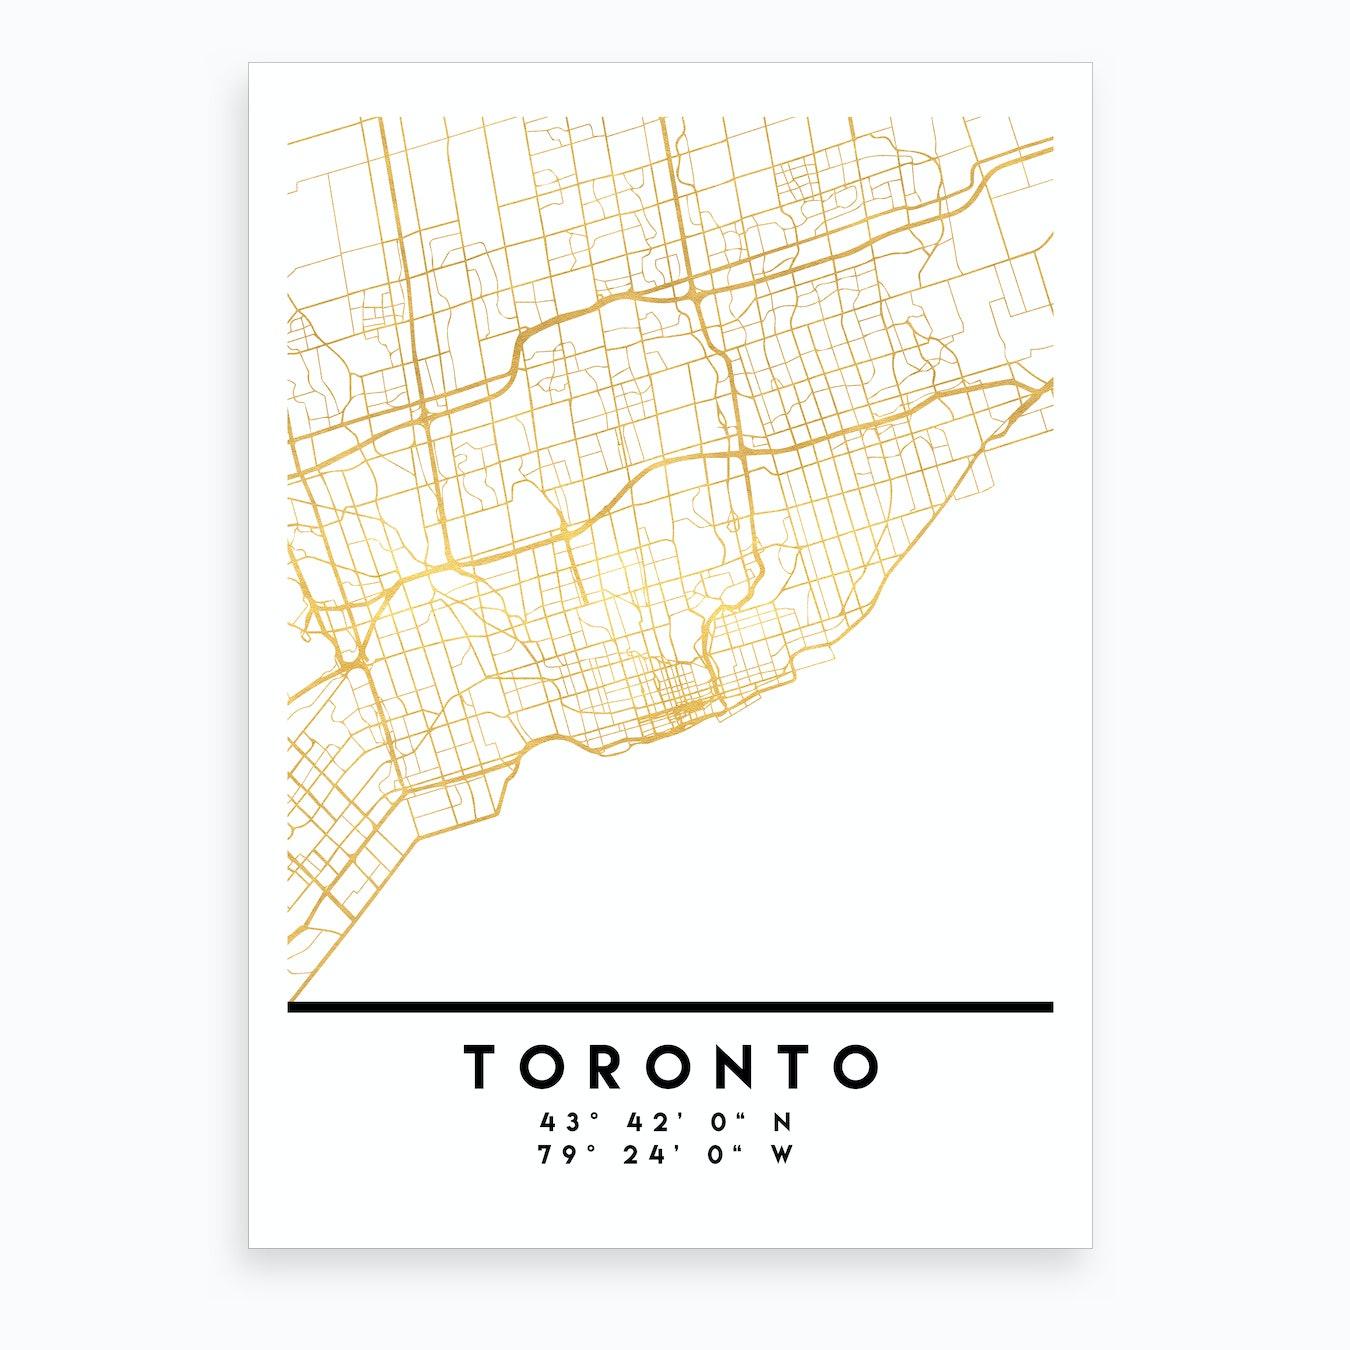 Toronto Canada City Street Map on map of philadelphia, map of california, shopping toronto canada, tourism toronto canada, map of hong kong, house toronto canada, hotels in toronto canada, road map toronto canada, provinces of canada, map of ohio, cn tower toronto canada, weather toronto canada, ontario canada, map of japan, map of usa, map of new york, map of istanbul turkey, map of las vegas, wonder mountain toronto canada, landmarks toronto canada,